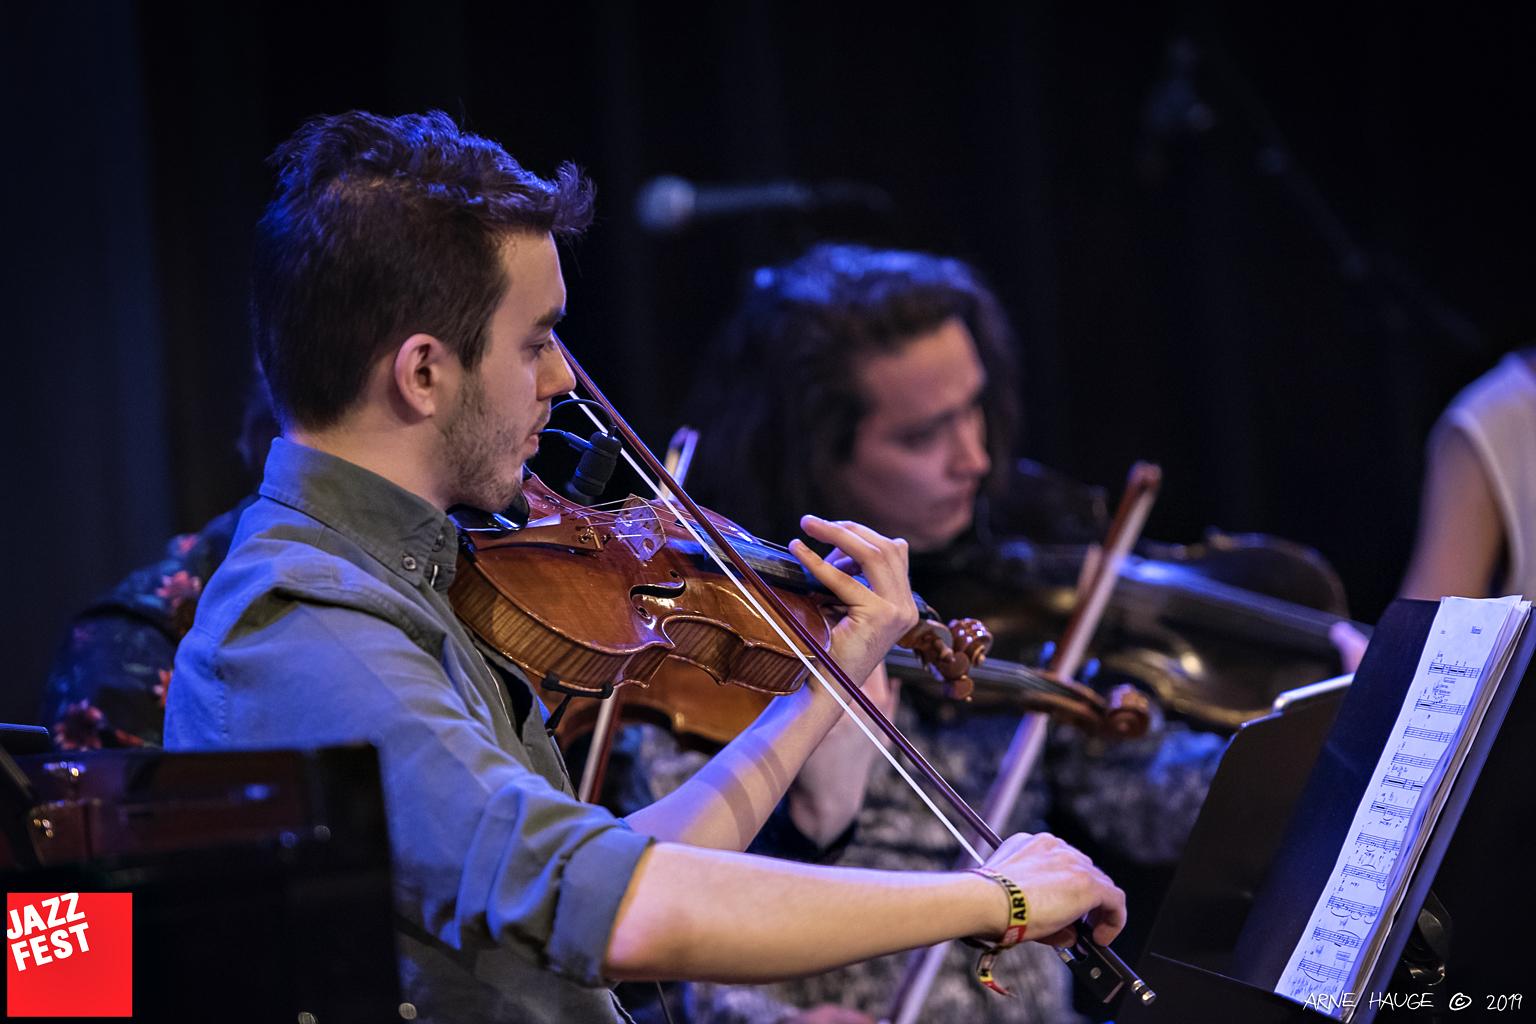 190510 Sondre Ferstad Ensemble (Jazz Expo) @ Dokkhuset - foto Arne Hauge_003.JPG